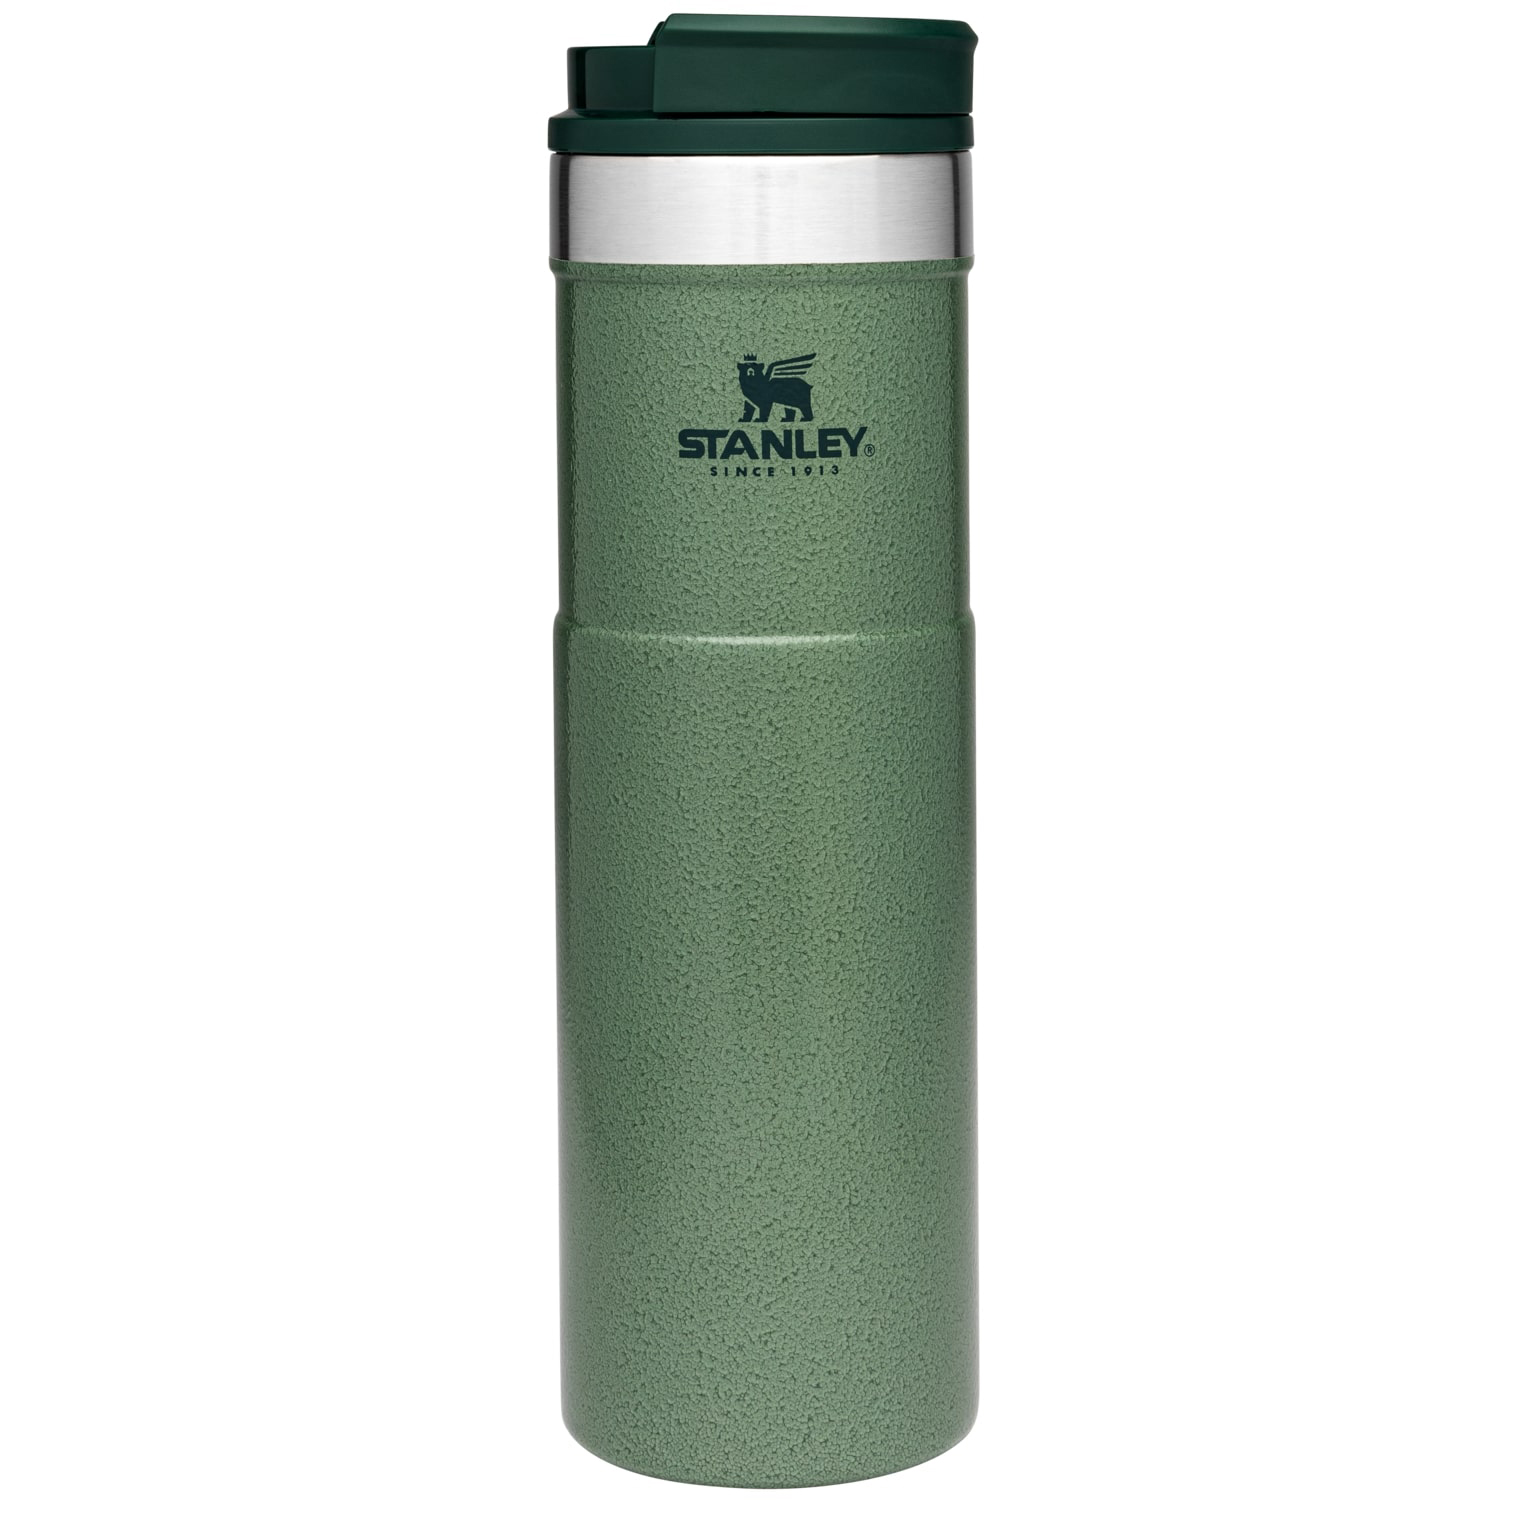 Stanley Classic The NeverLeak Travel Mug 20oz - 0.59L - HM Green